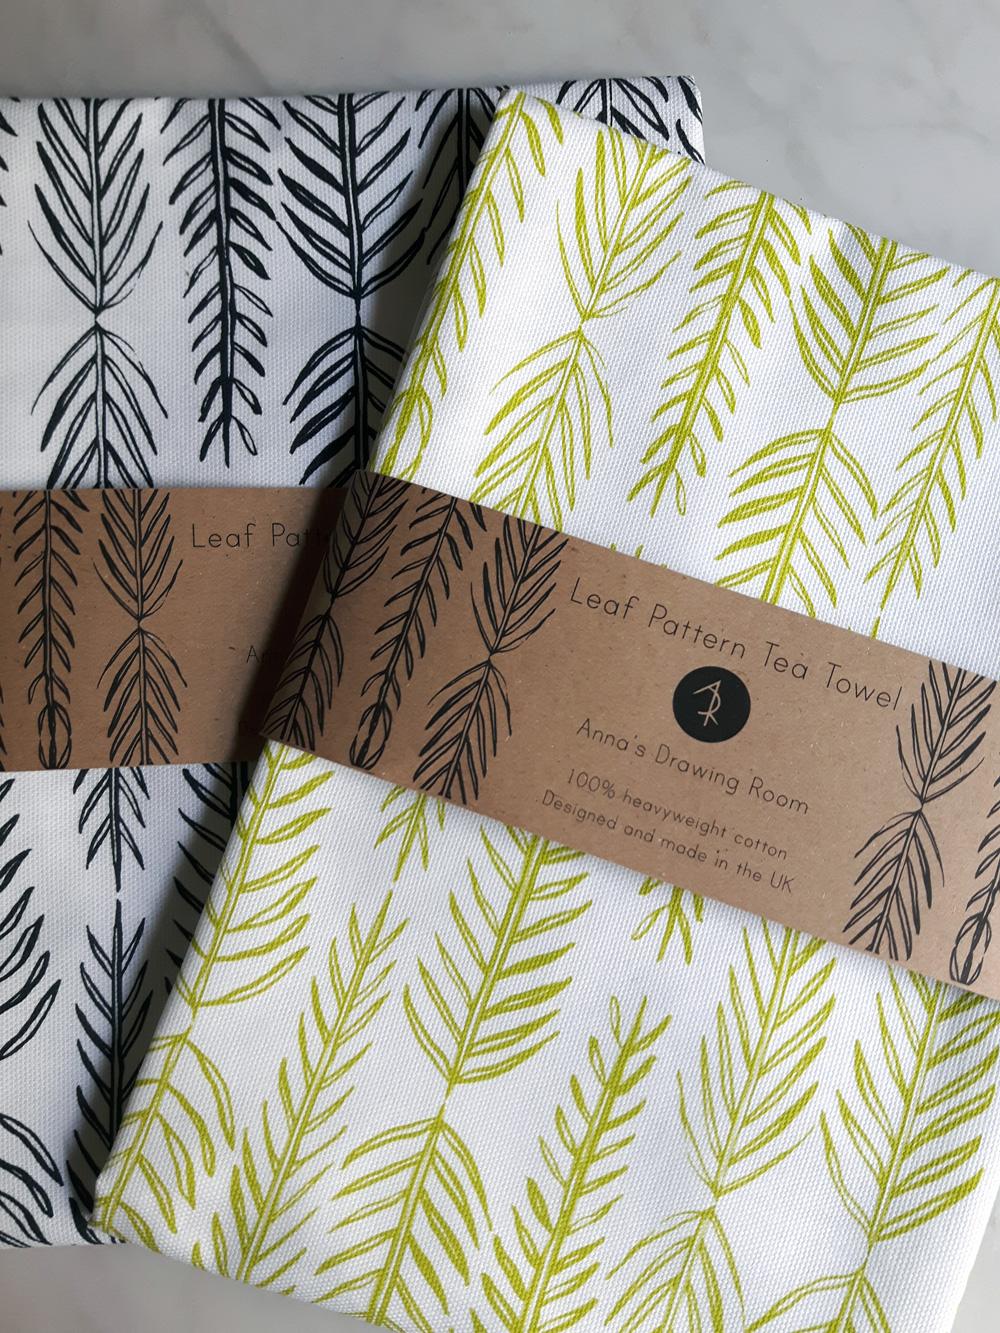 Leaf-pattern-Tea-towels-both-packaged